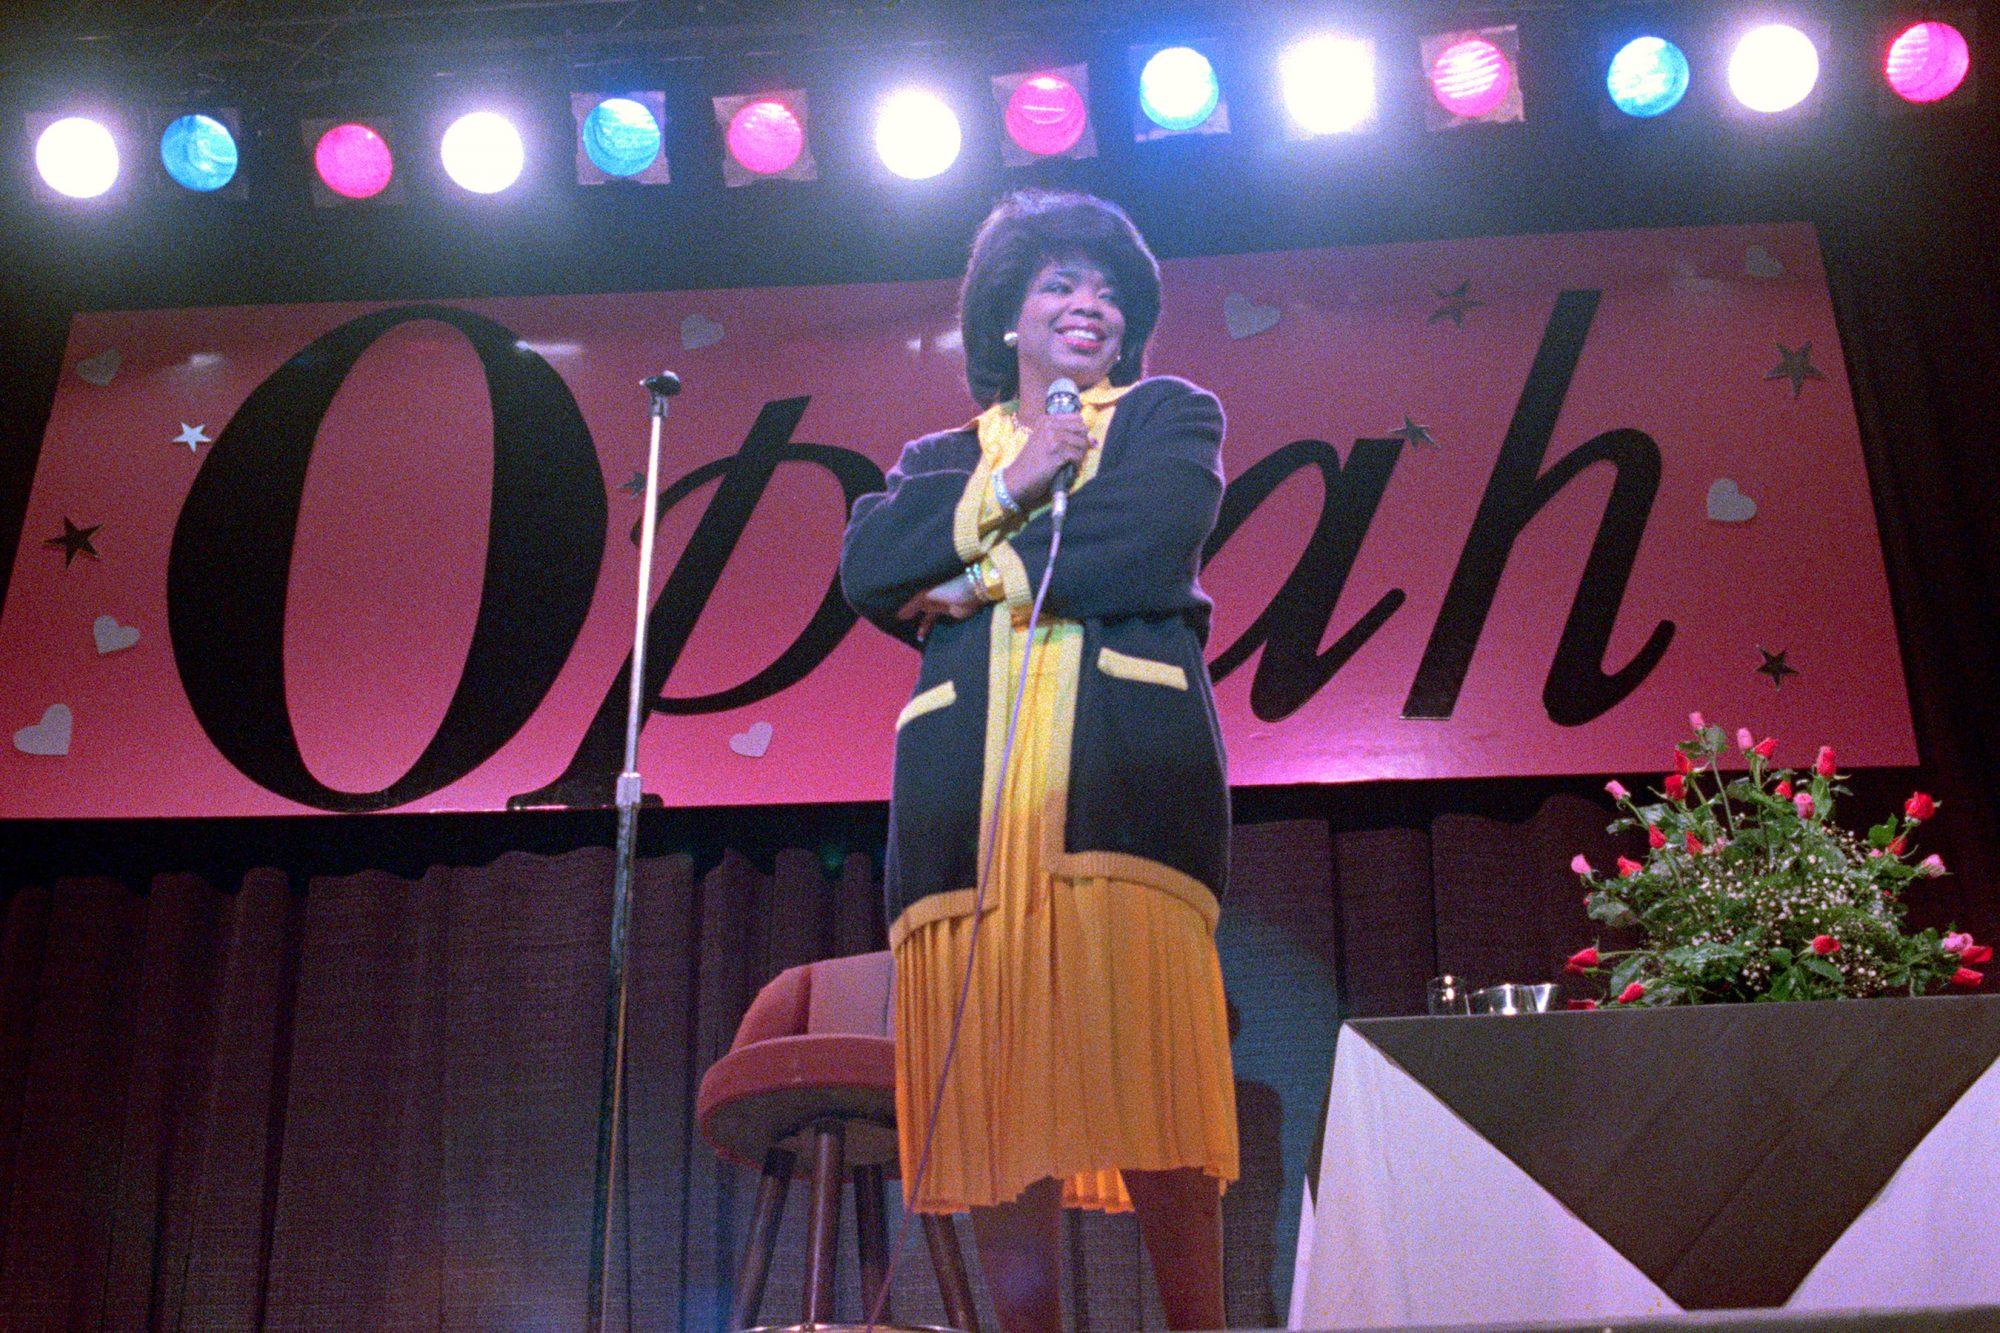 Oprah Winfrey Entertaining on Stage